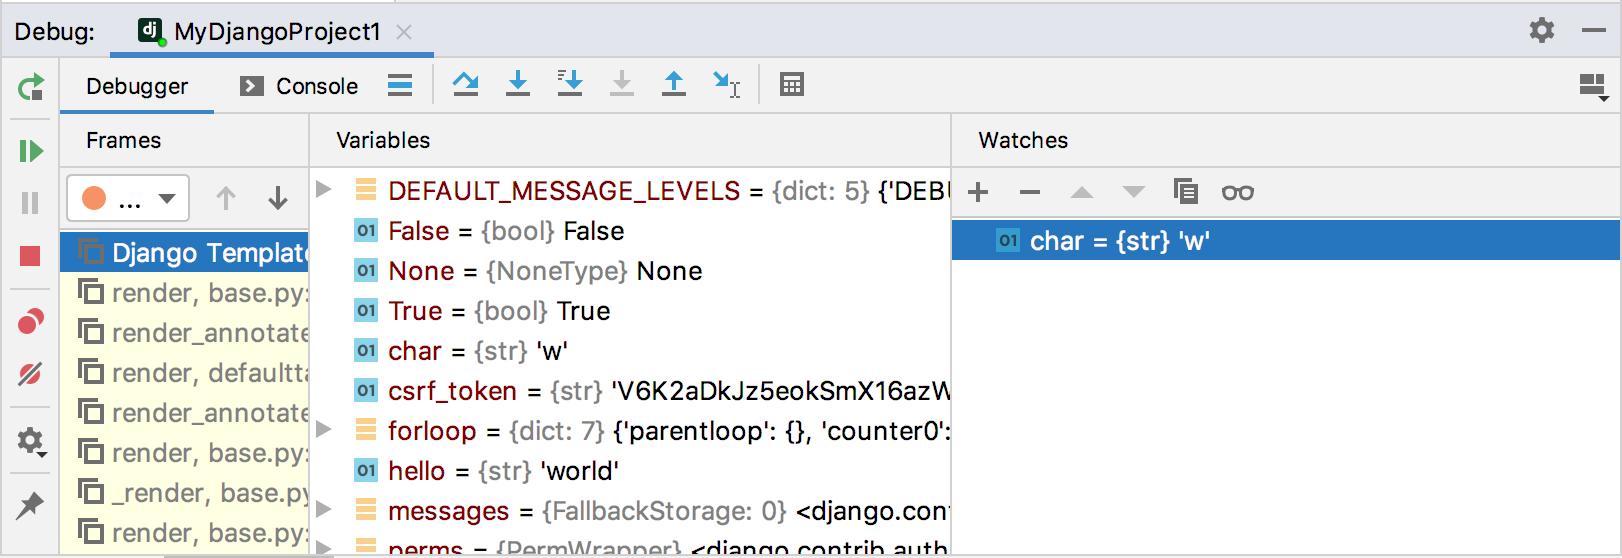 Watching in the debug tool window